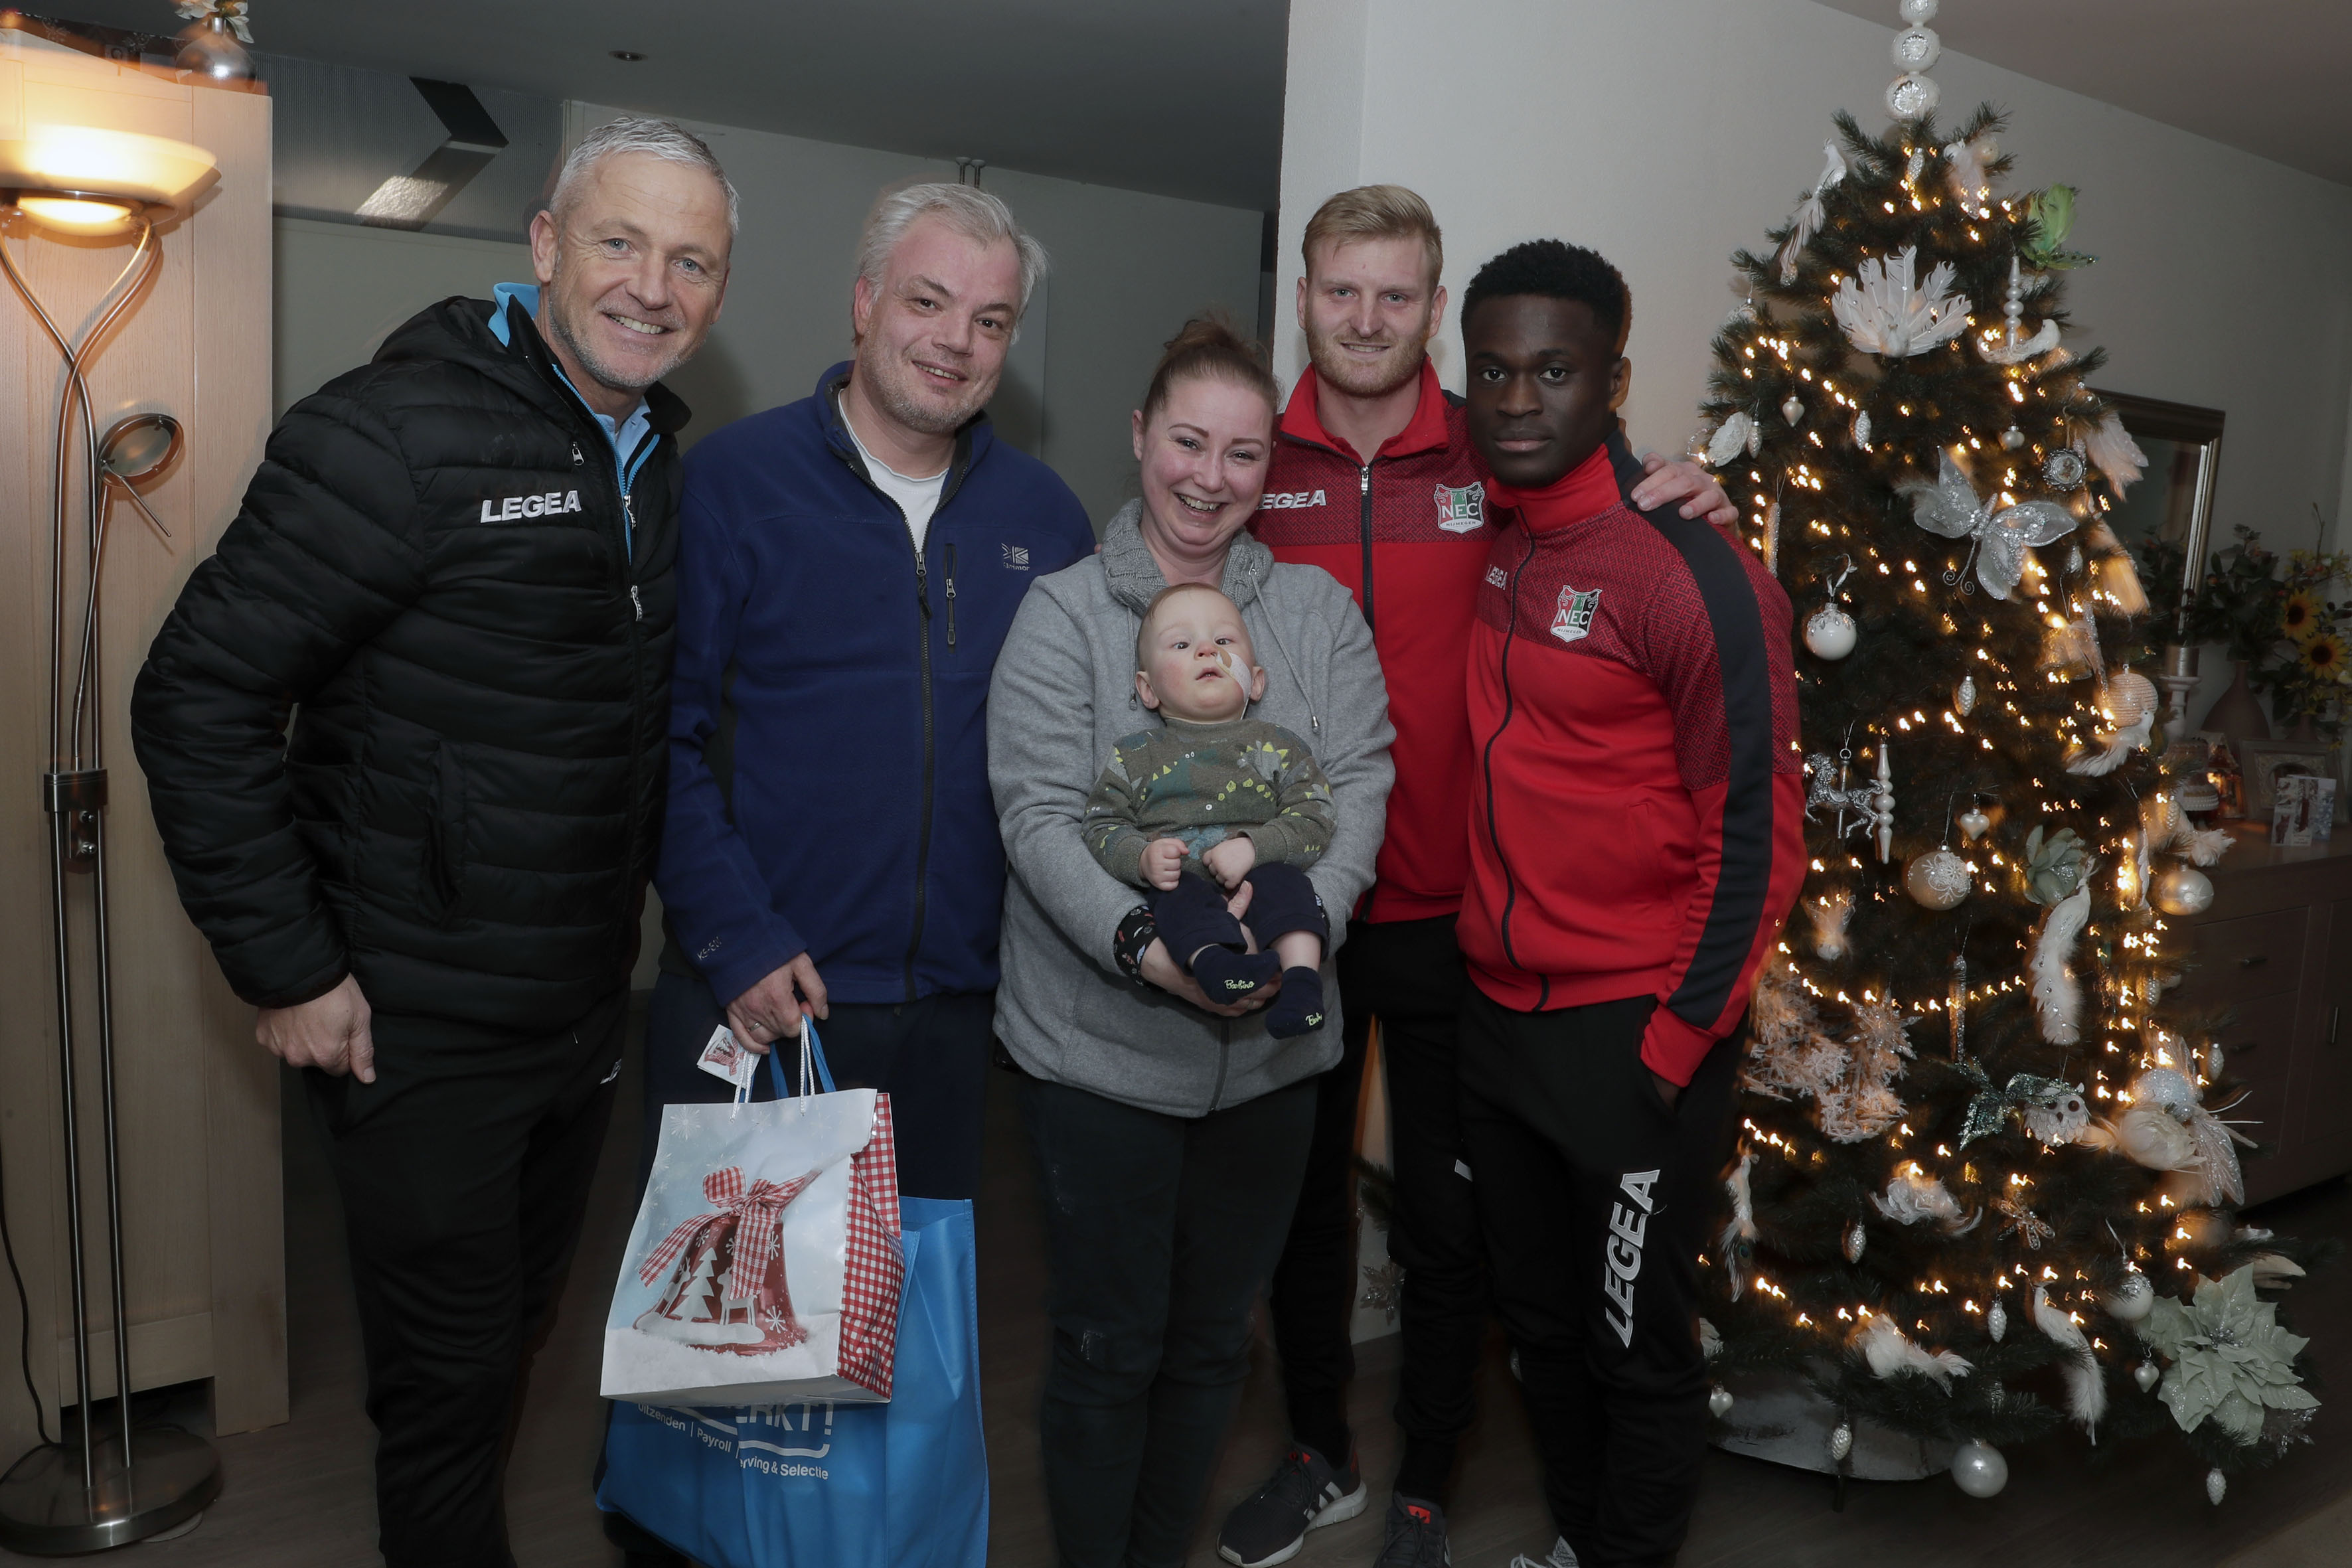 N.E.C. verrast supporters met kerstpakket